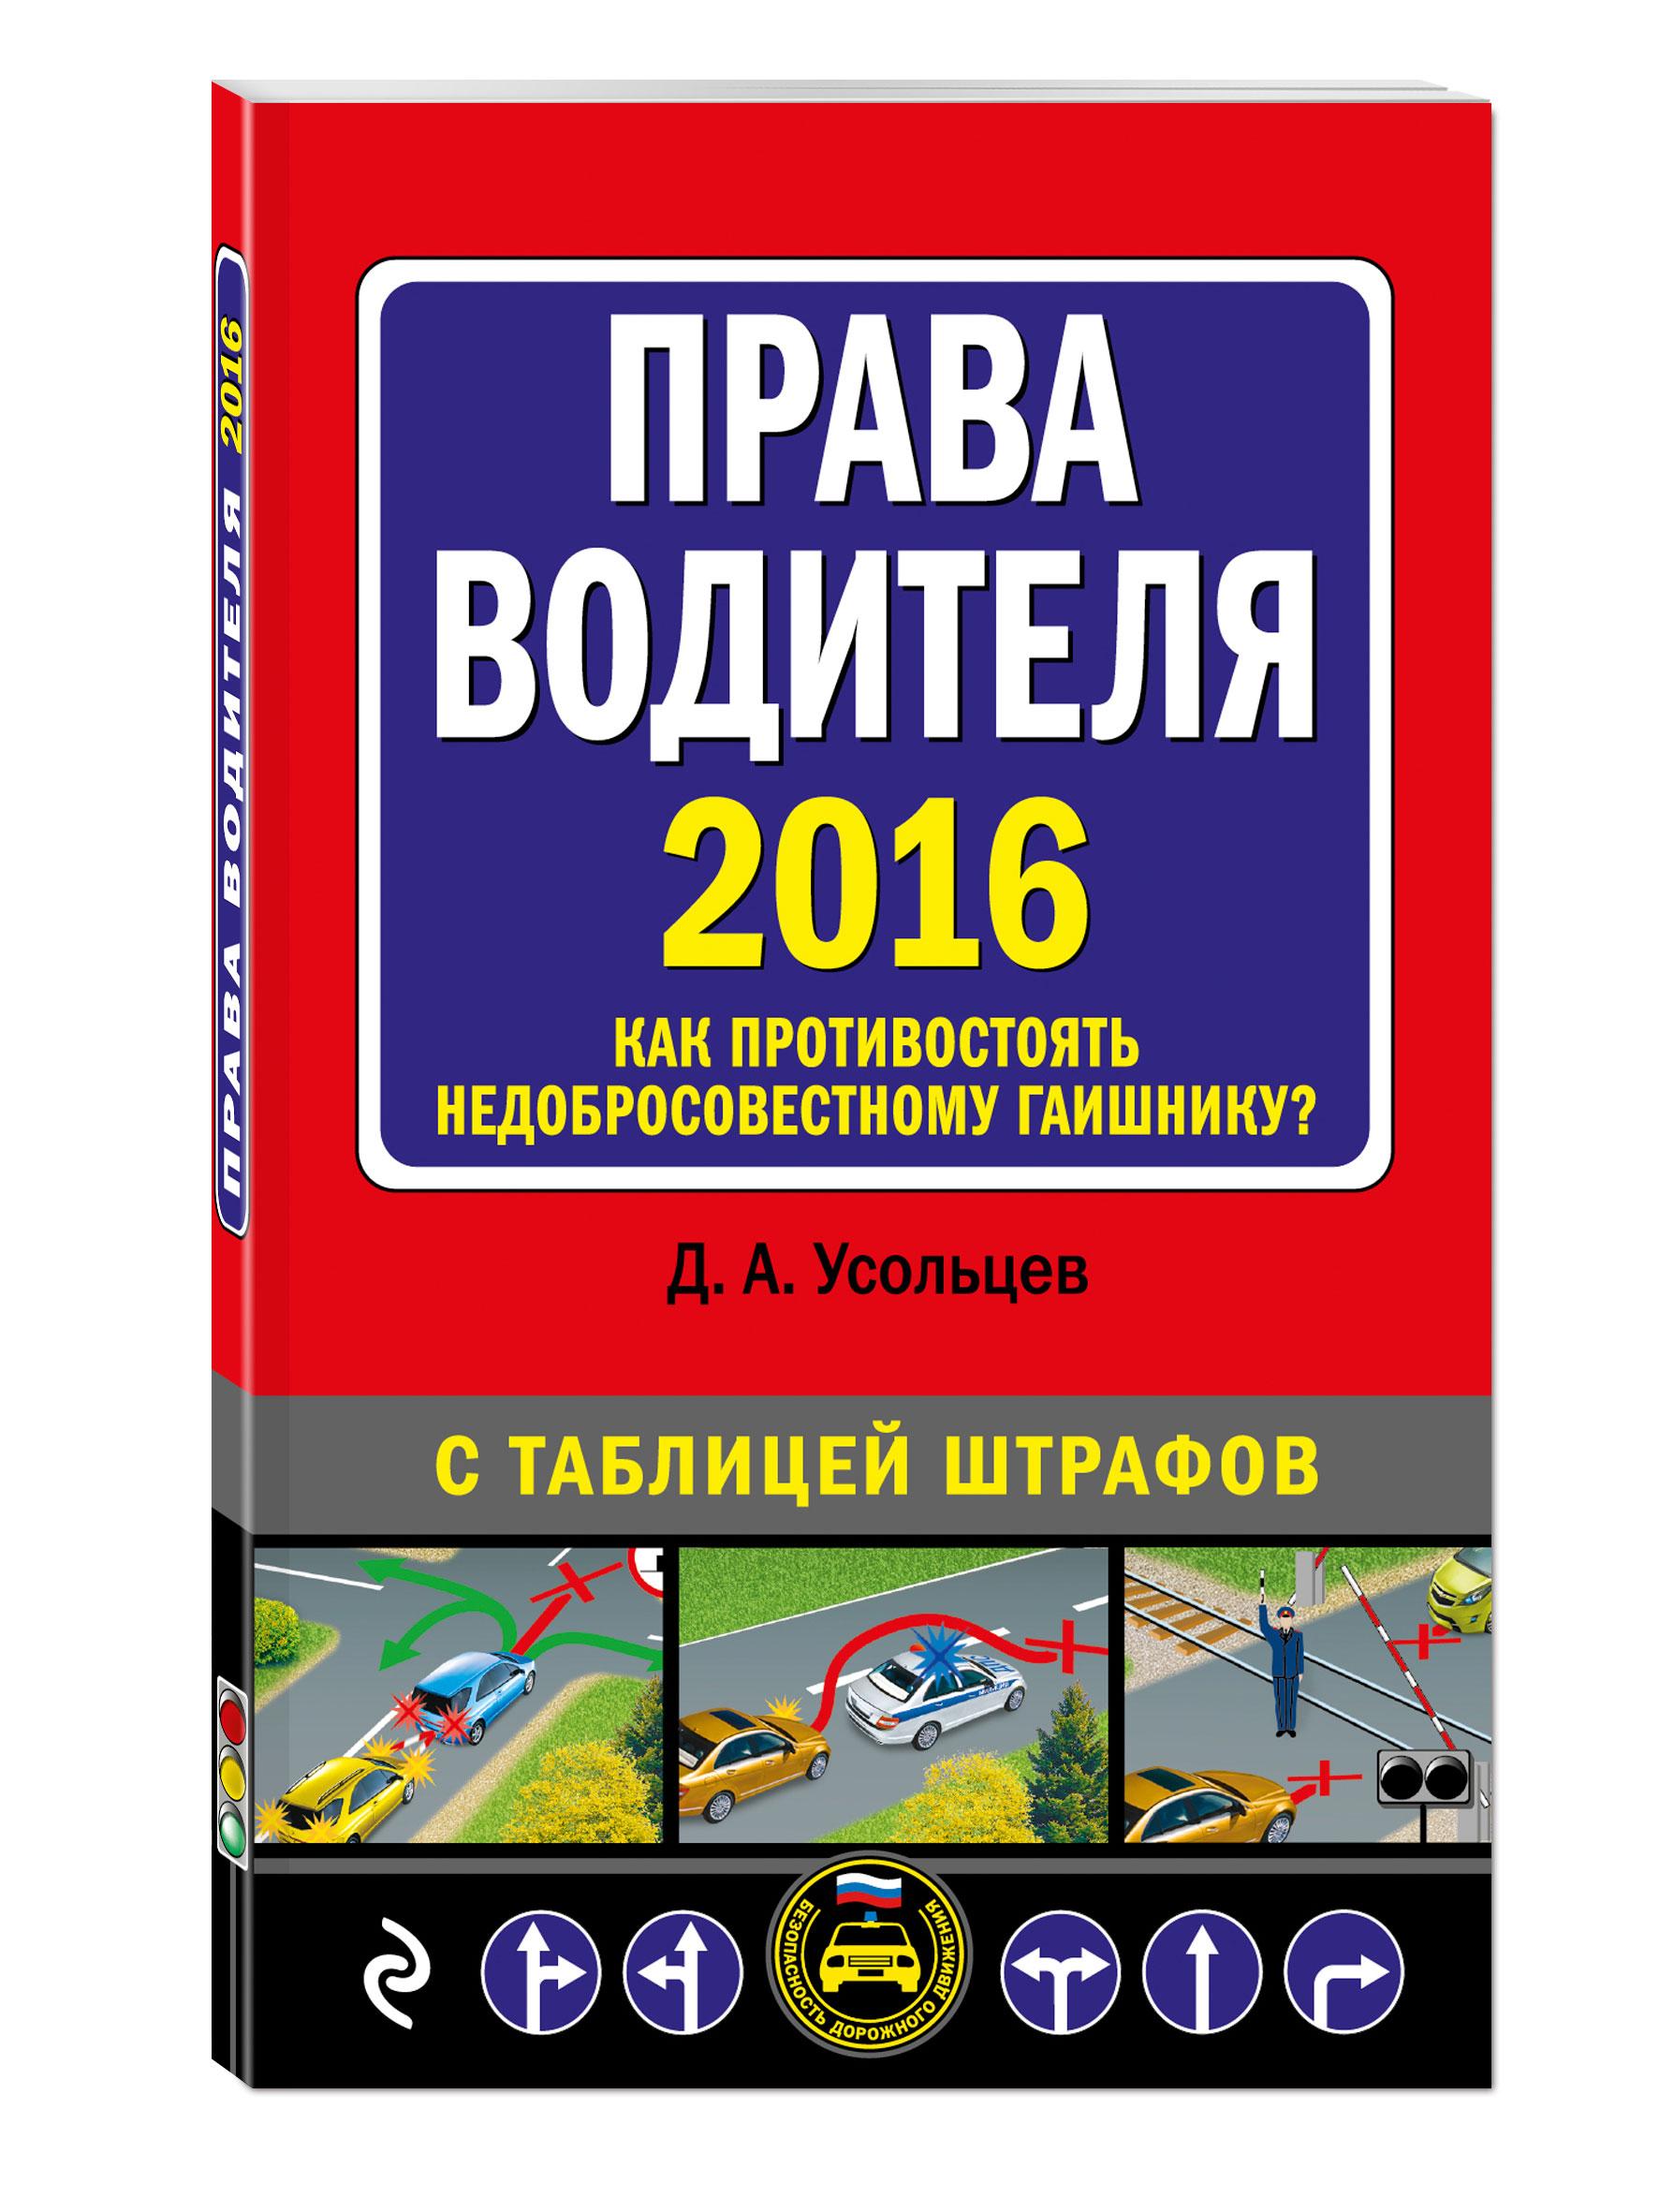 Права водителя. Как противостоять недобросовестному гаишнику? (с изменениями на 2016 год) от book24.ru